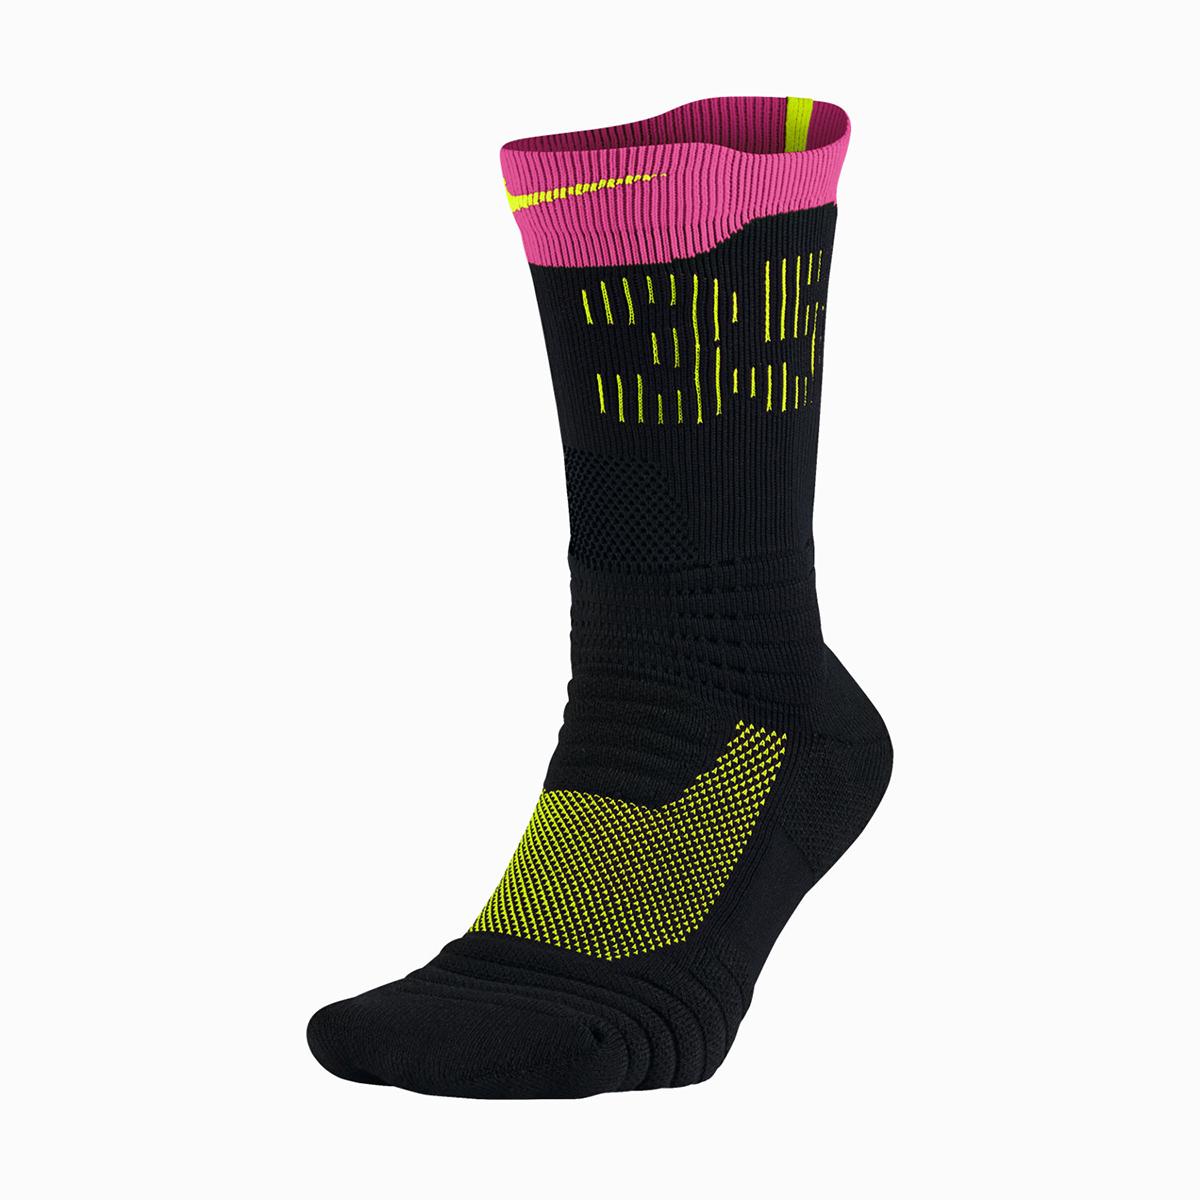 f23bcba19e0ceb Nike Elite KD Versatility Crew Socks - BASKETBALL SHOES Basketball Socks -  Superfanas.lt